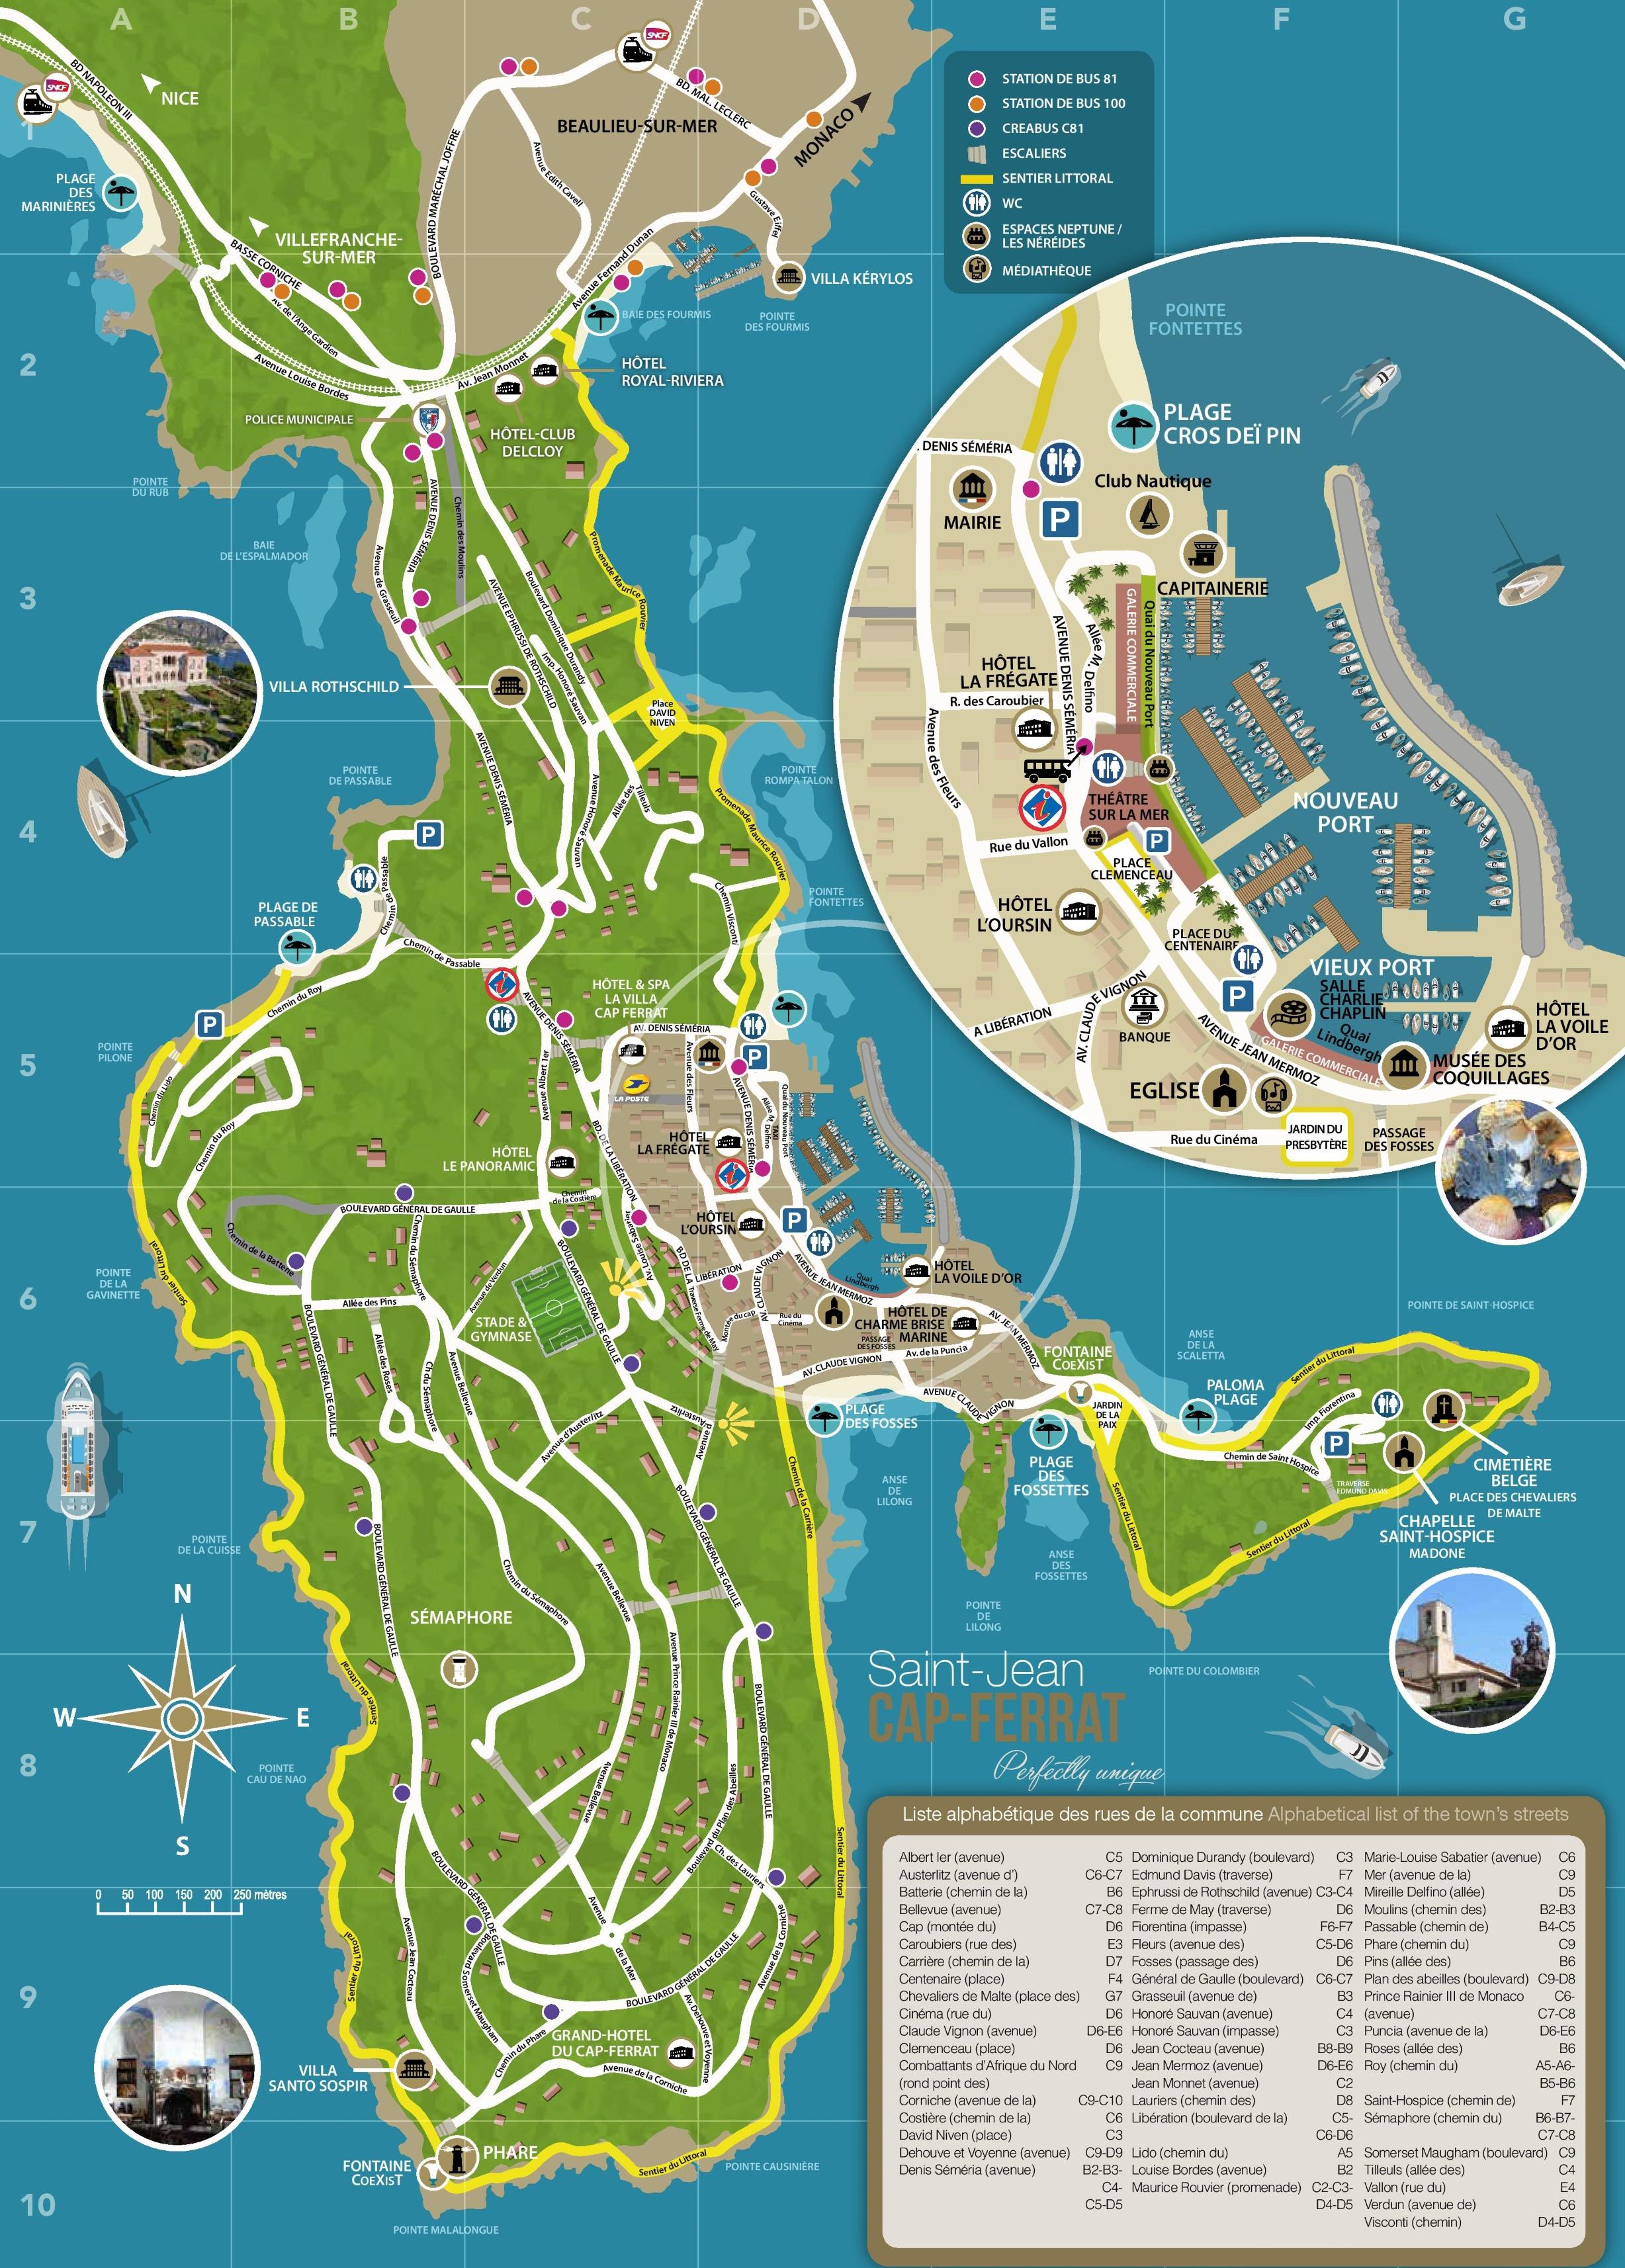 SaintJeanCapFerrat tourist map